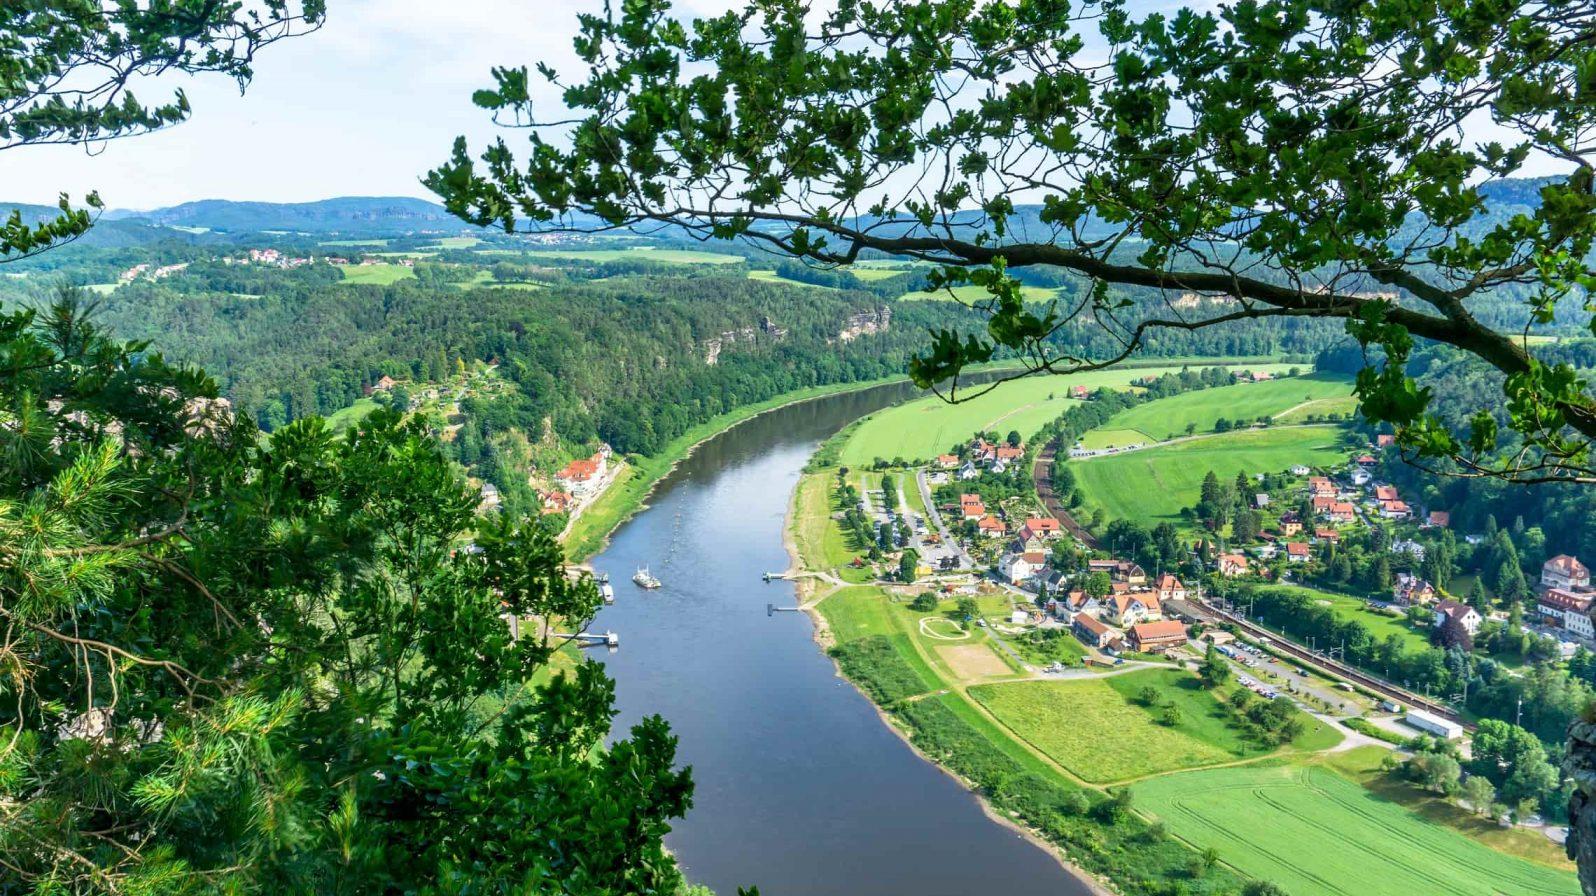 Elben-mutka-elbejoki-1596x896.jpeg